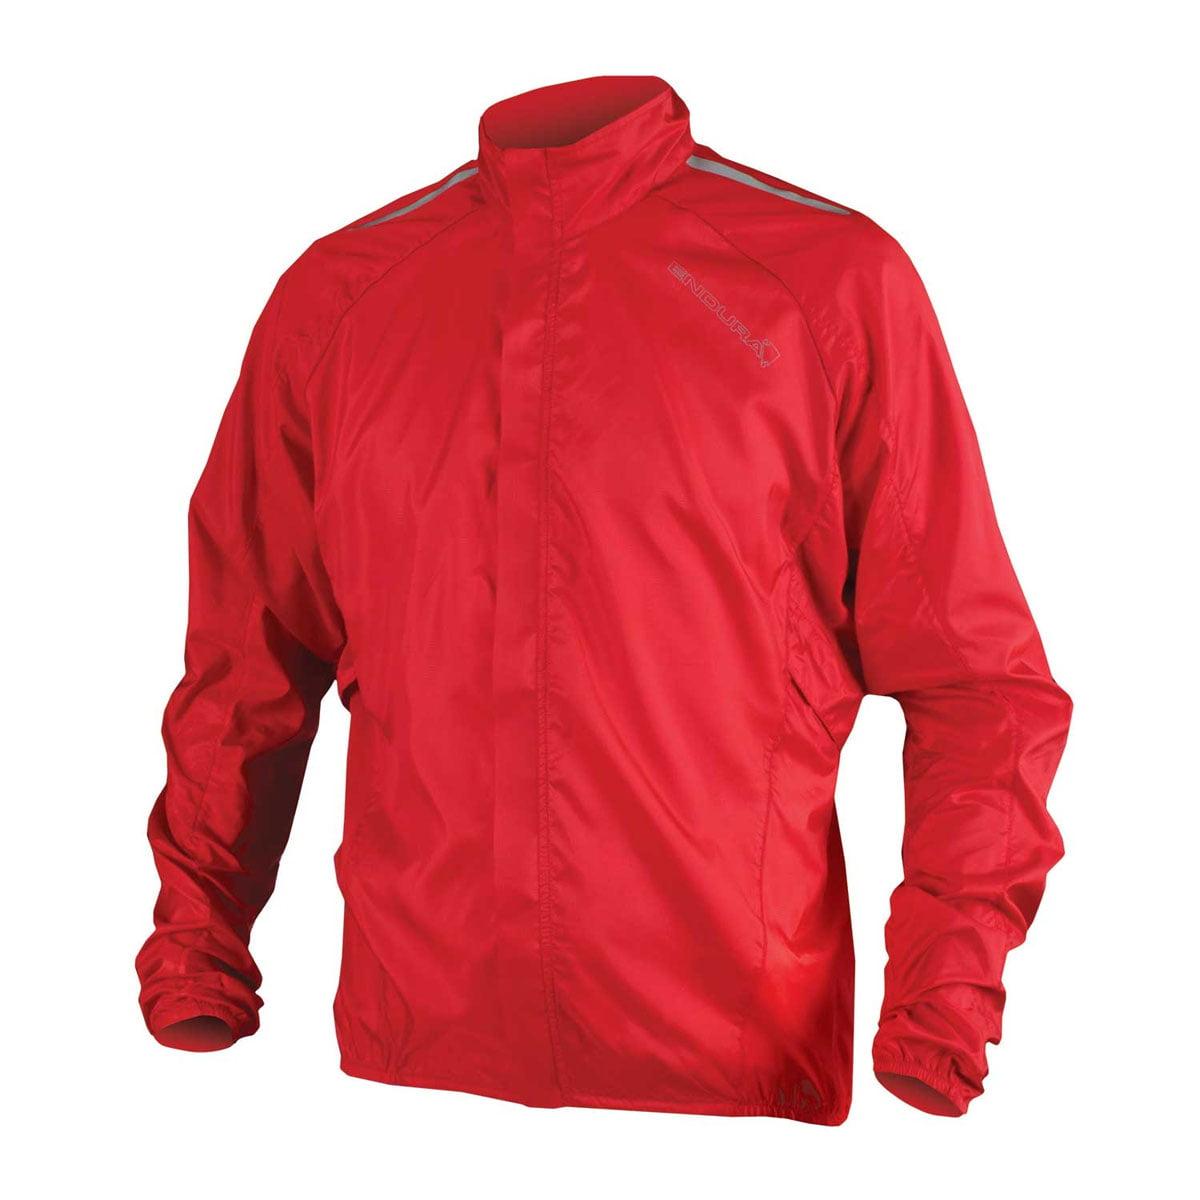 Endura 2016 Men's Pakajak Ultra Packable Windproof Cycling Jacket E3059 by Endura